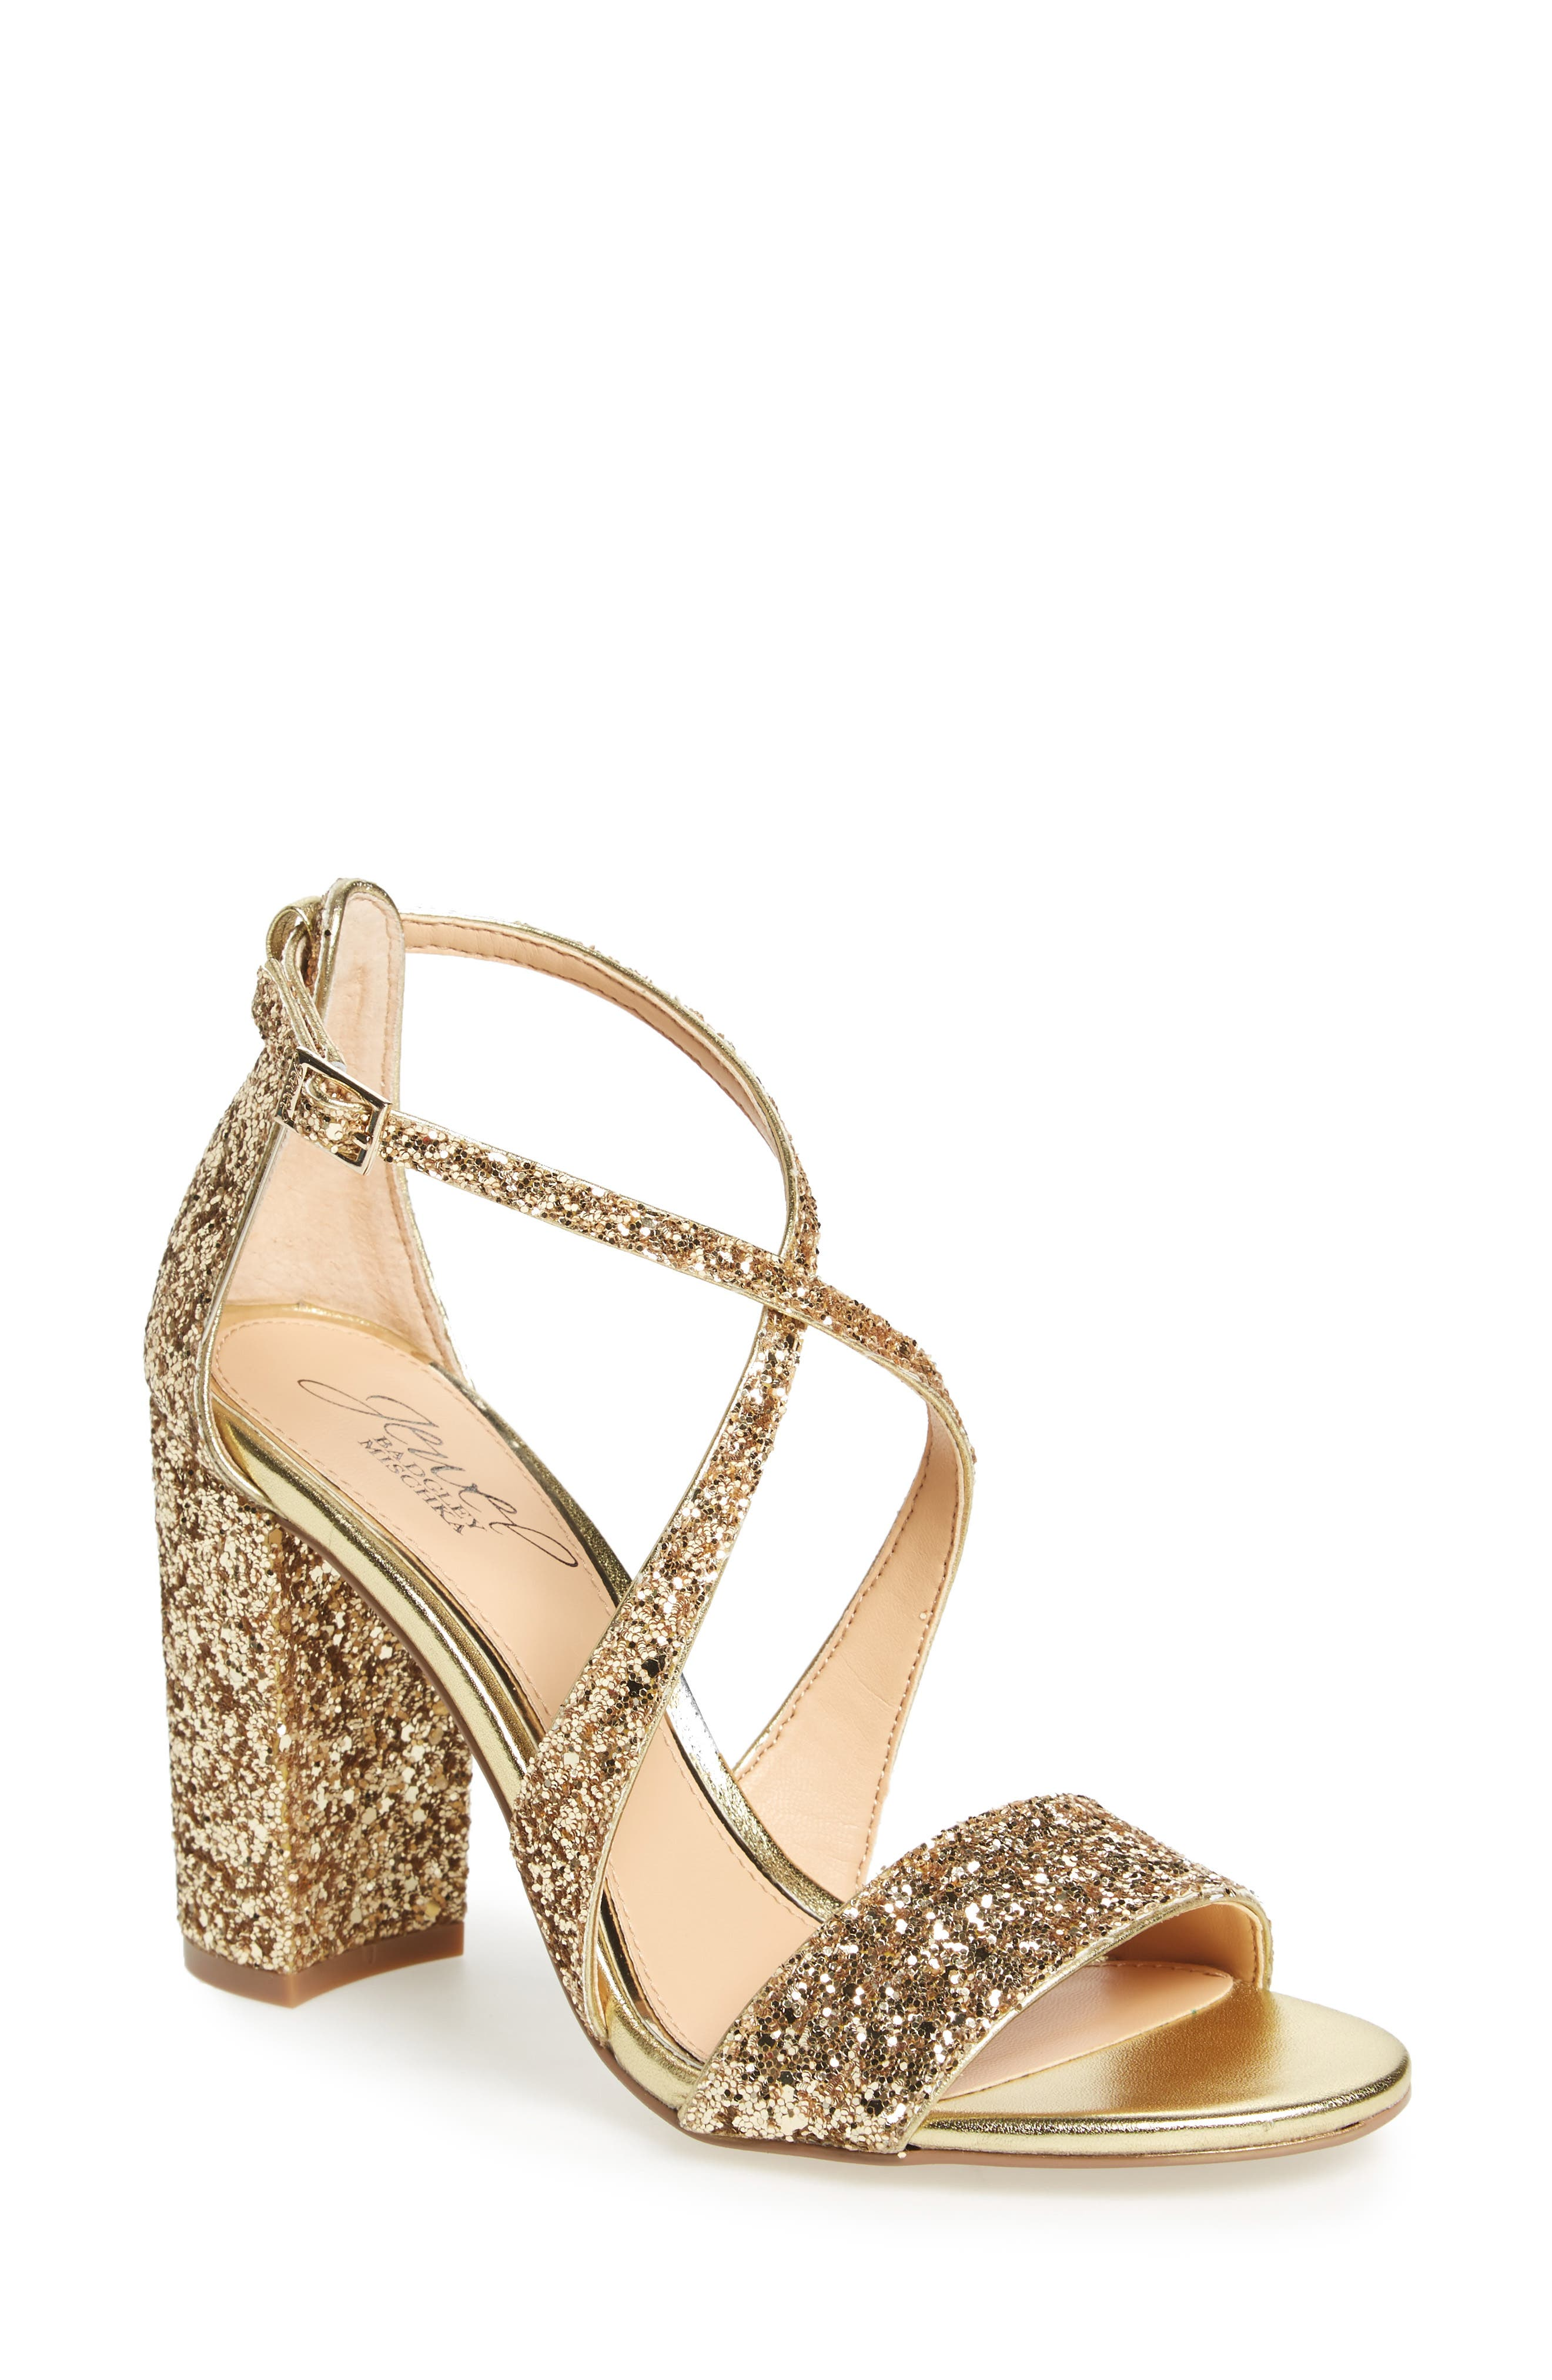 Cook Block Heel Glitter Sandal,                         Main,                         color, GOLD LEATHER